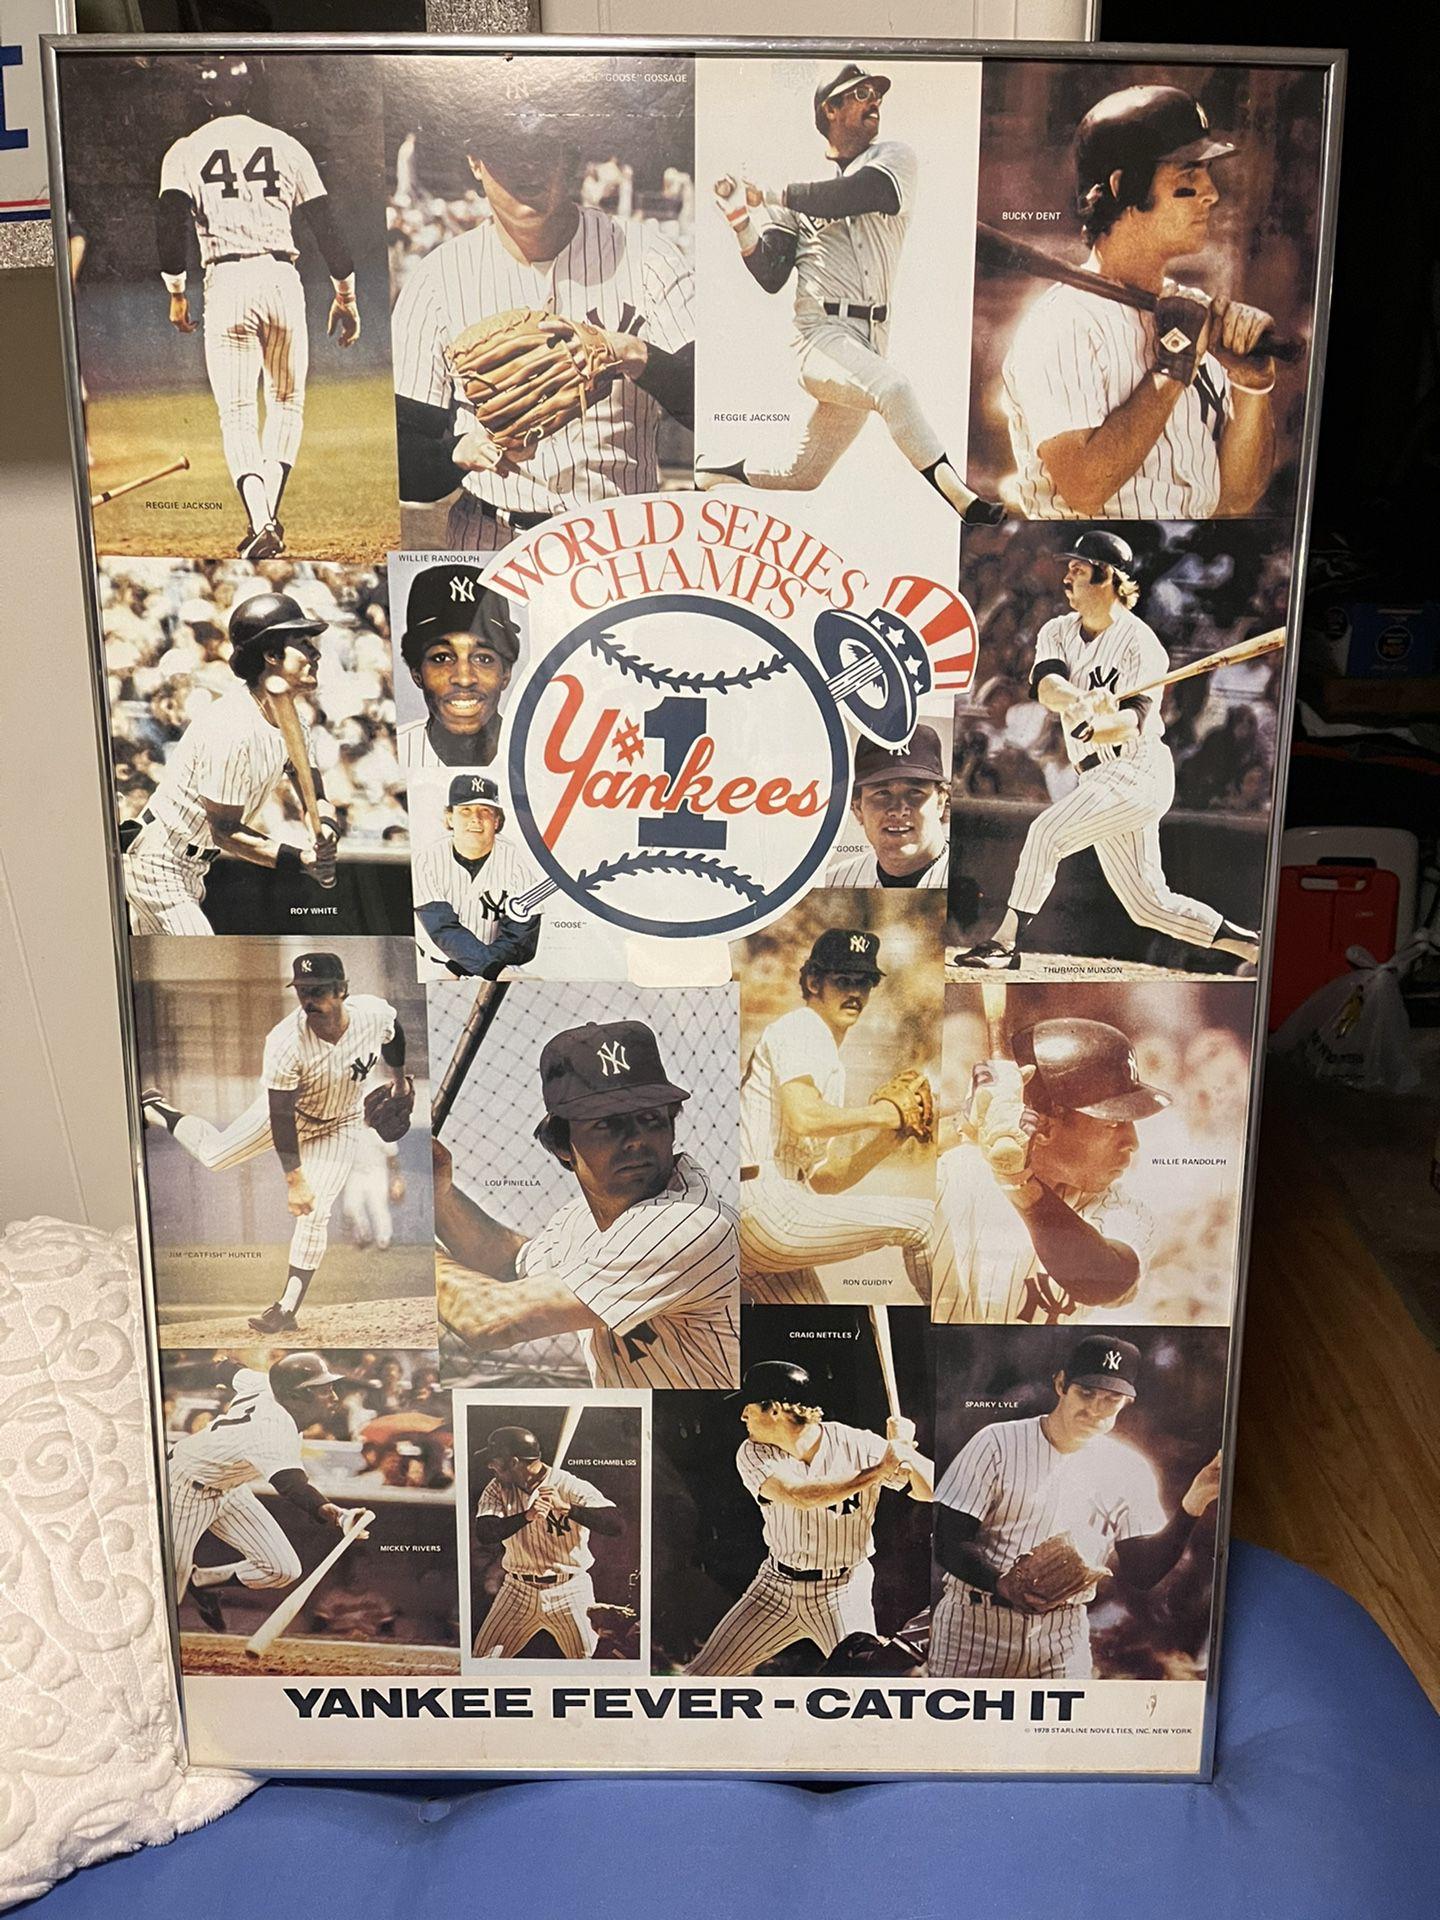 1978 NY Yankees Poster Framed